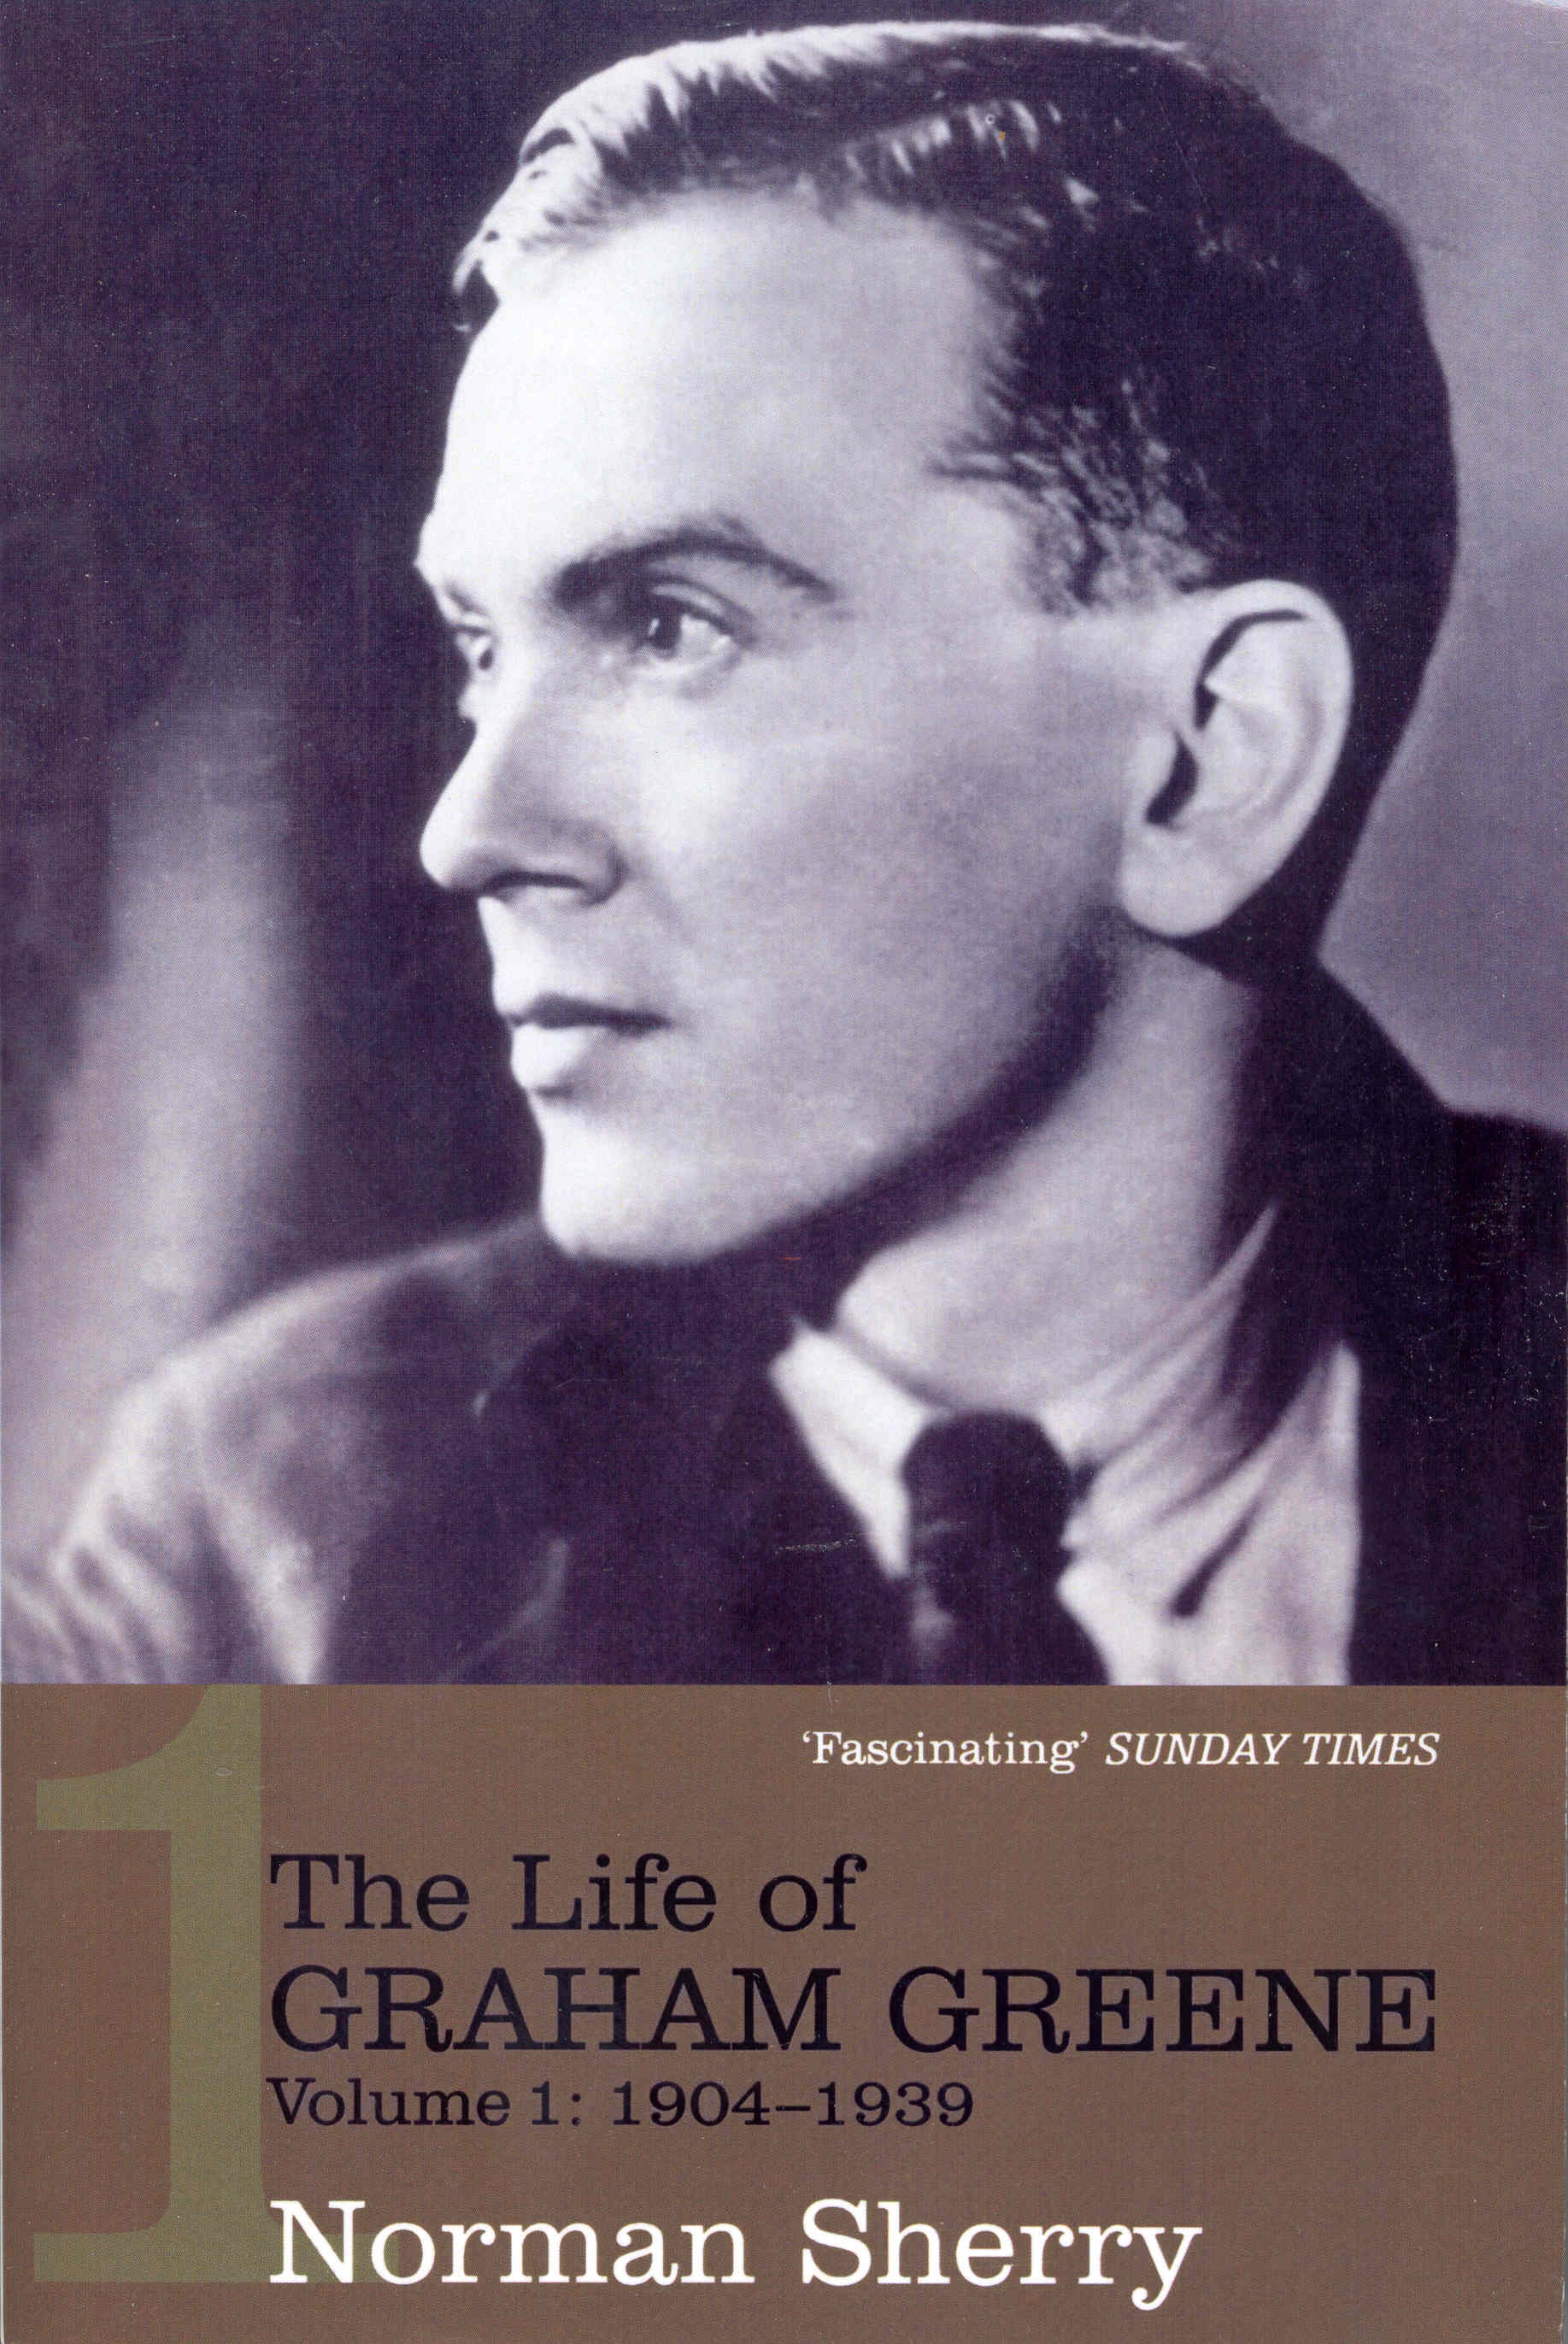 Norman Sherry - The Life of Graham Greene 1